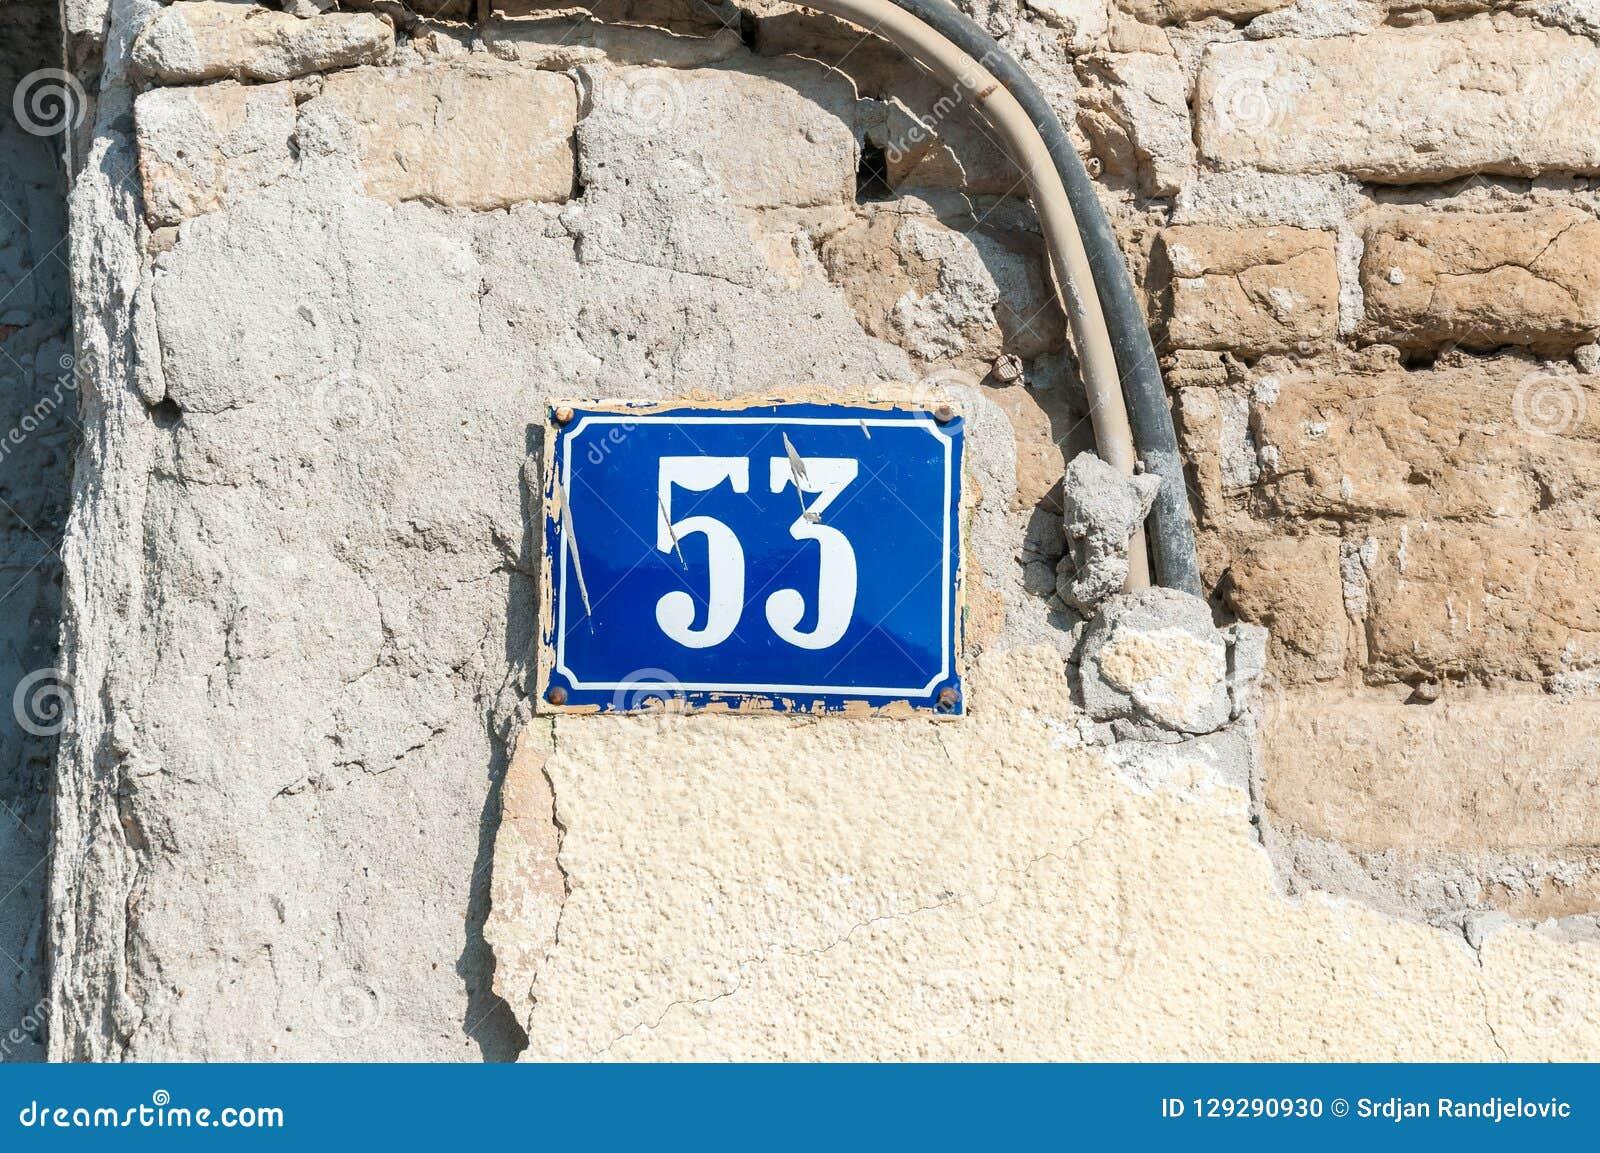 Old Vintage House Address Blue Metal Plate Number 53 Fifty